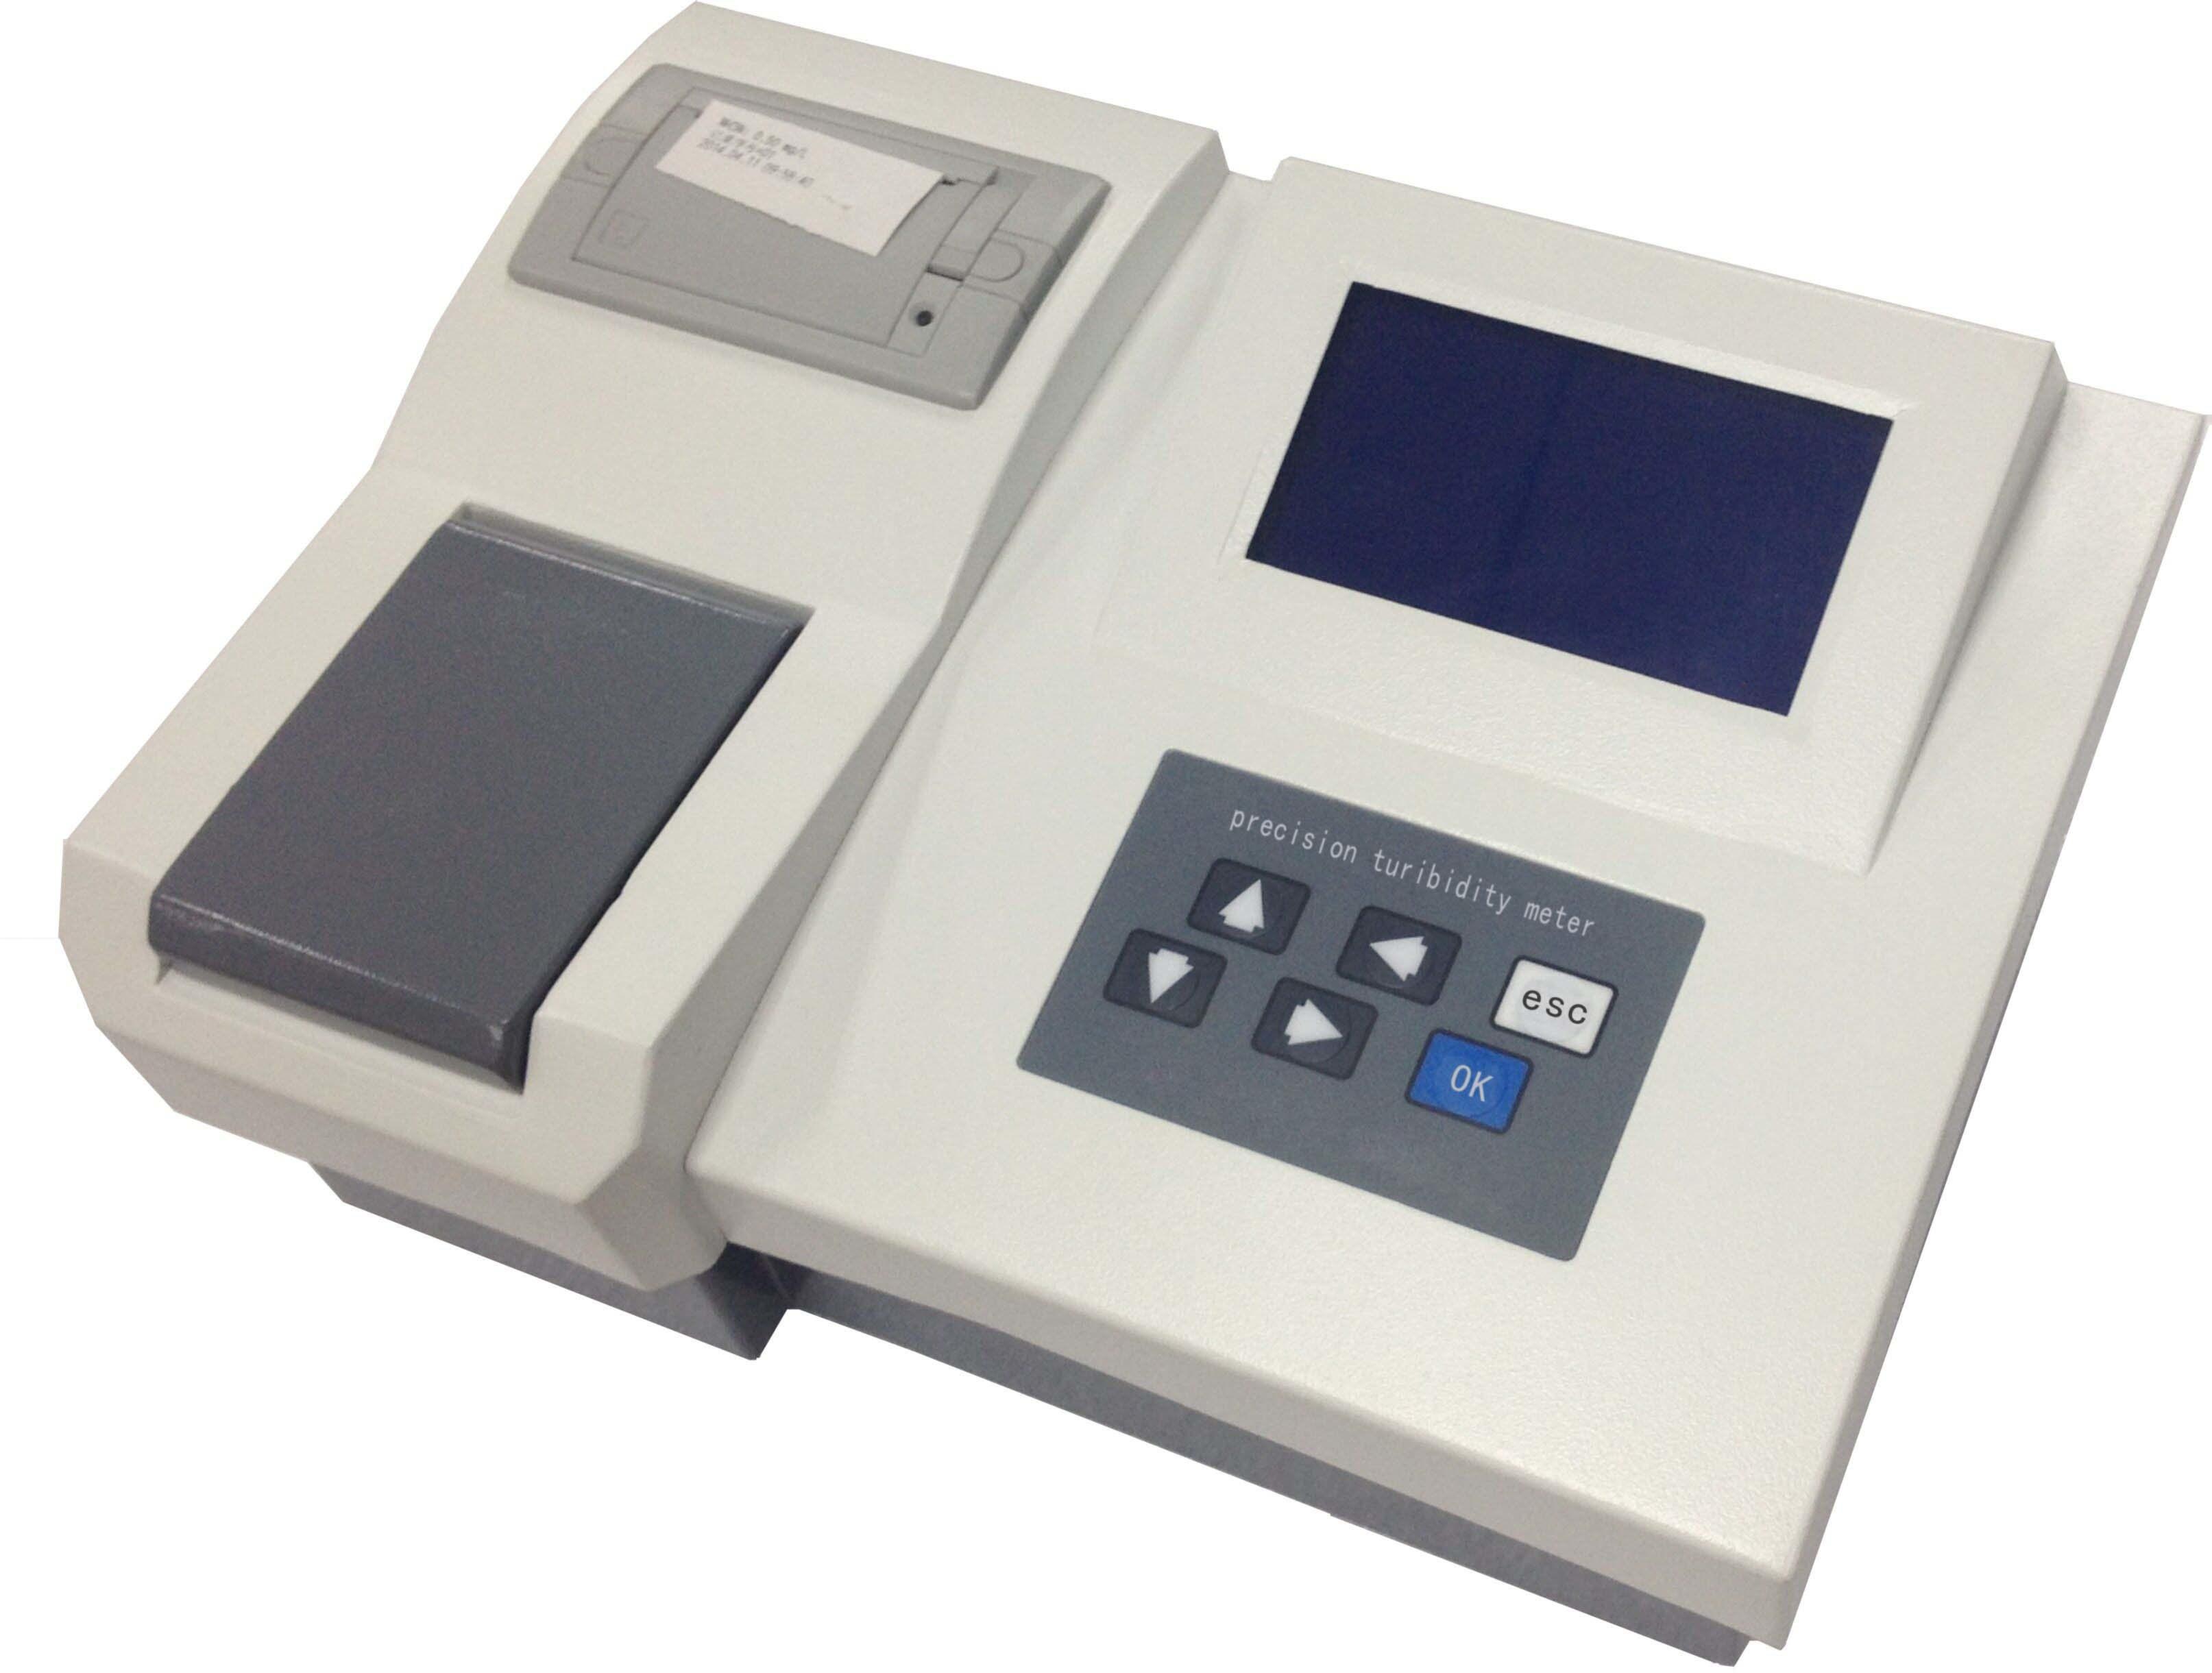 China Biobase Laboratory Digital Turbidimeter, Nephelometer Price - China  Cheap Turbidimeter, Lab Turbidimeter